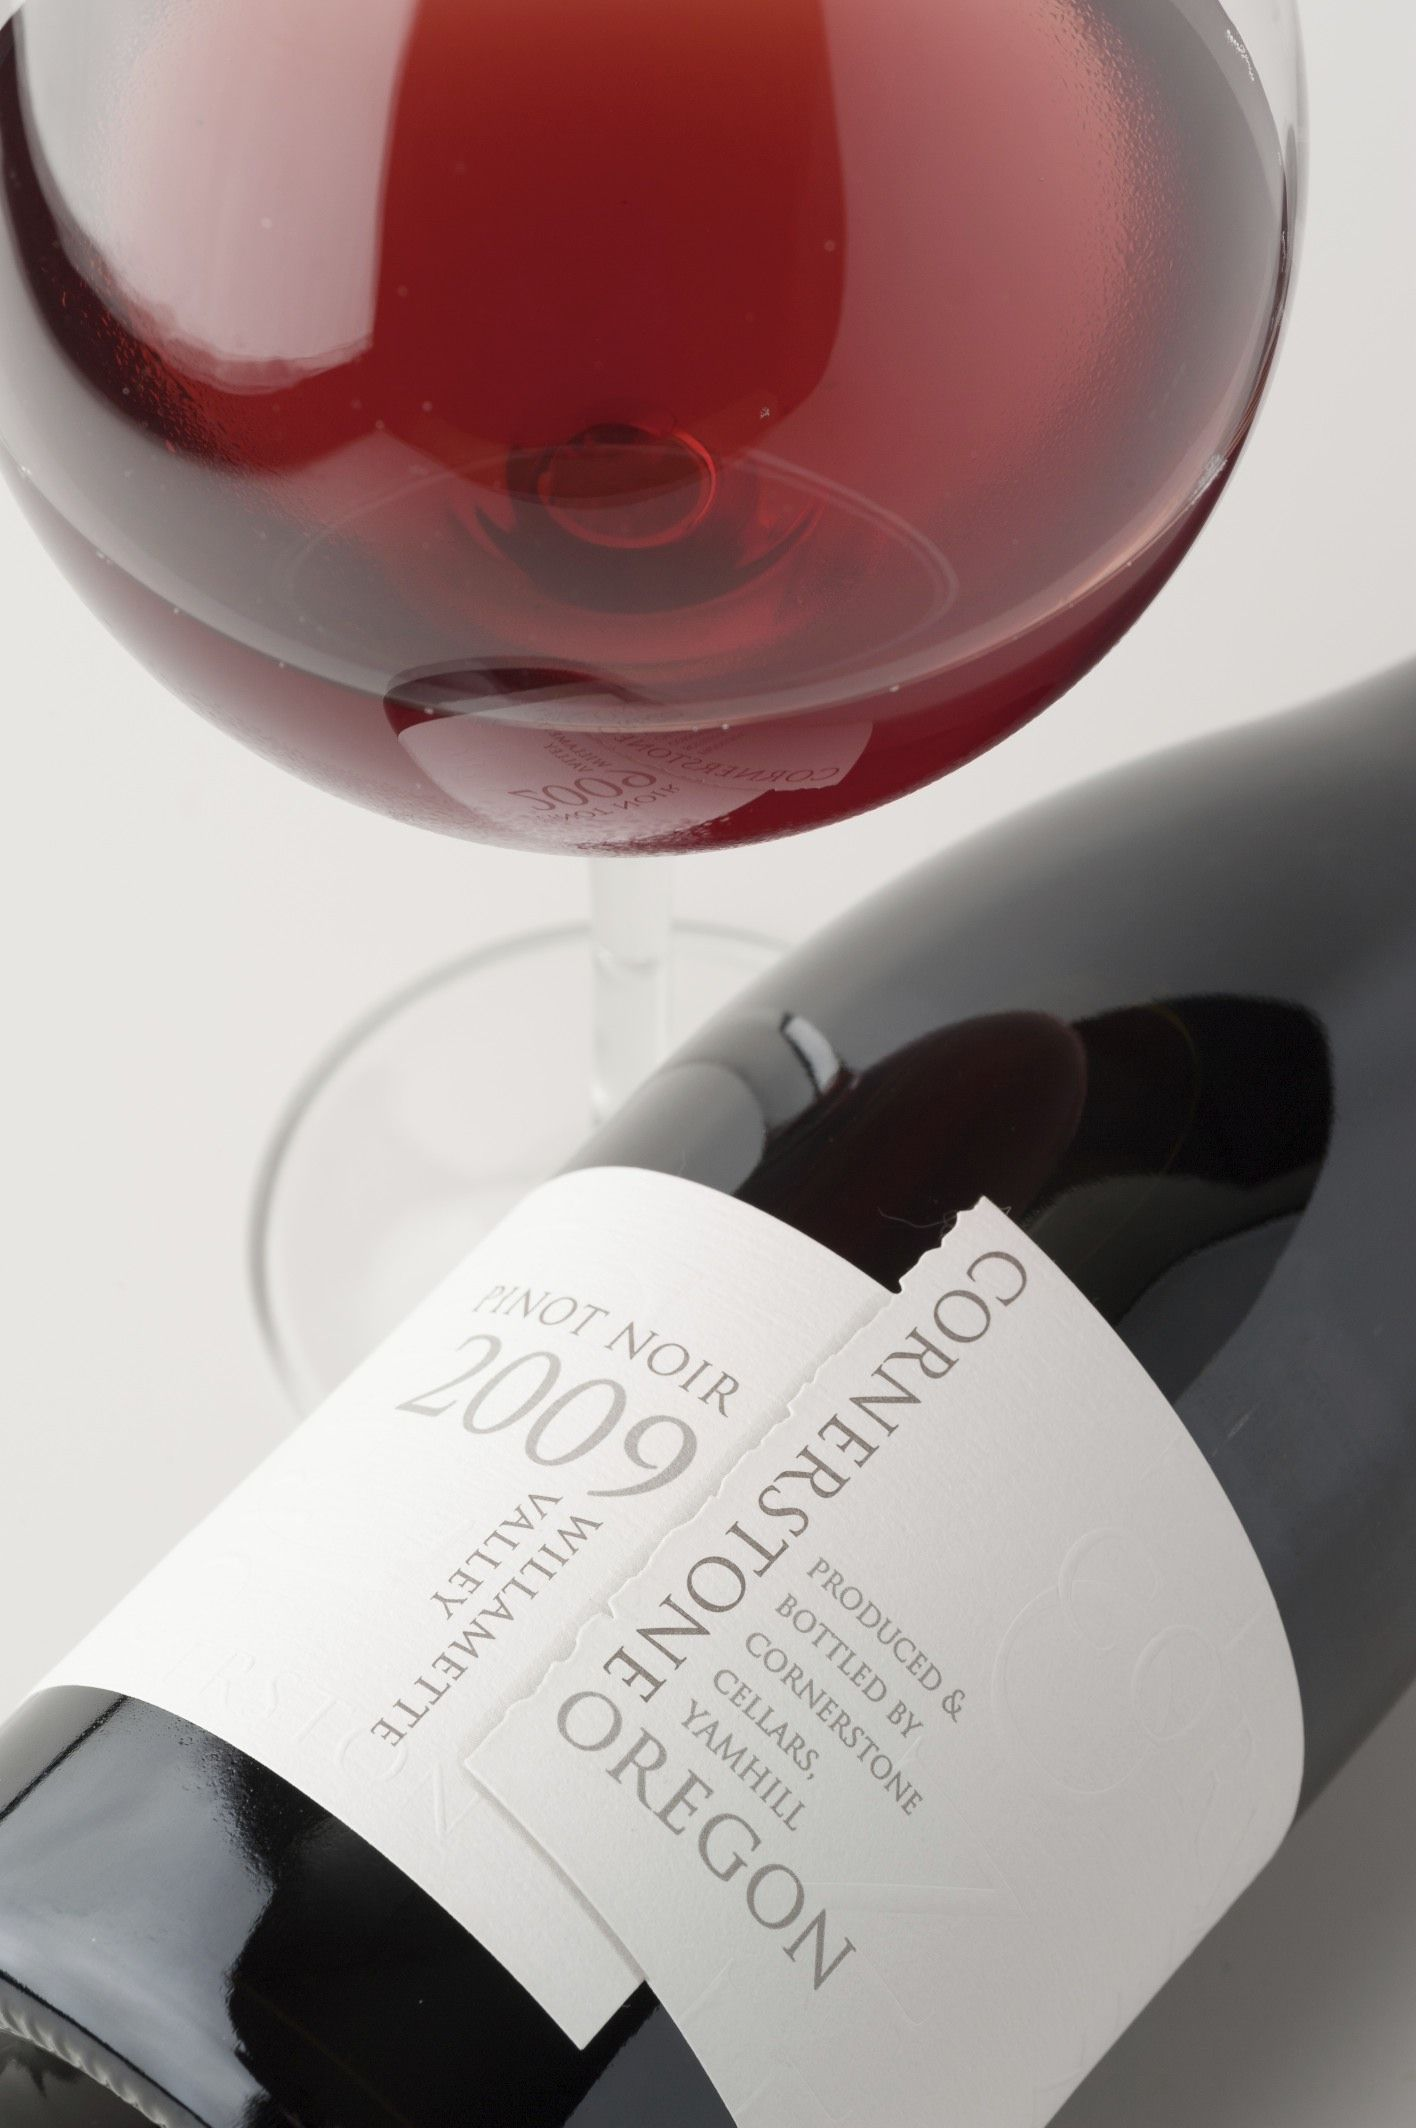 New Photo Of Our 2010 Cornerstone Oregon Willamette Valley Pinot Noir Wine Bottle Shots I Love Pinot Noir Wine Wines